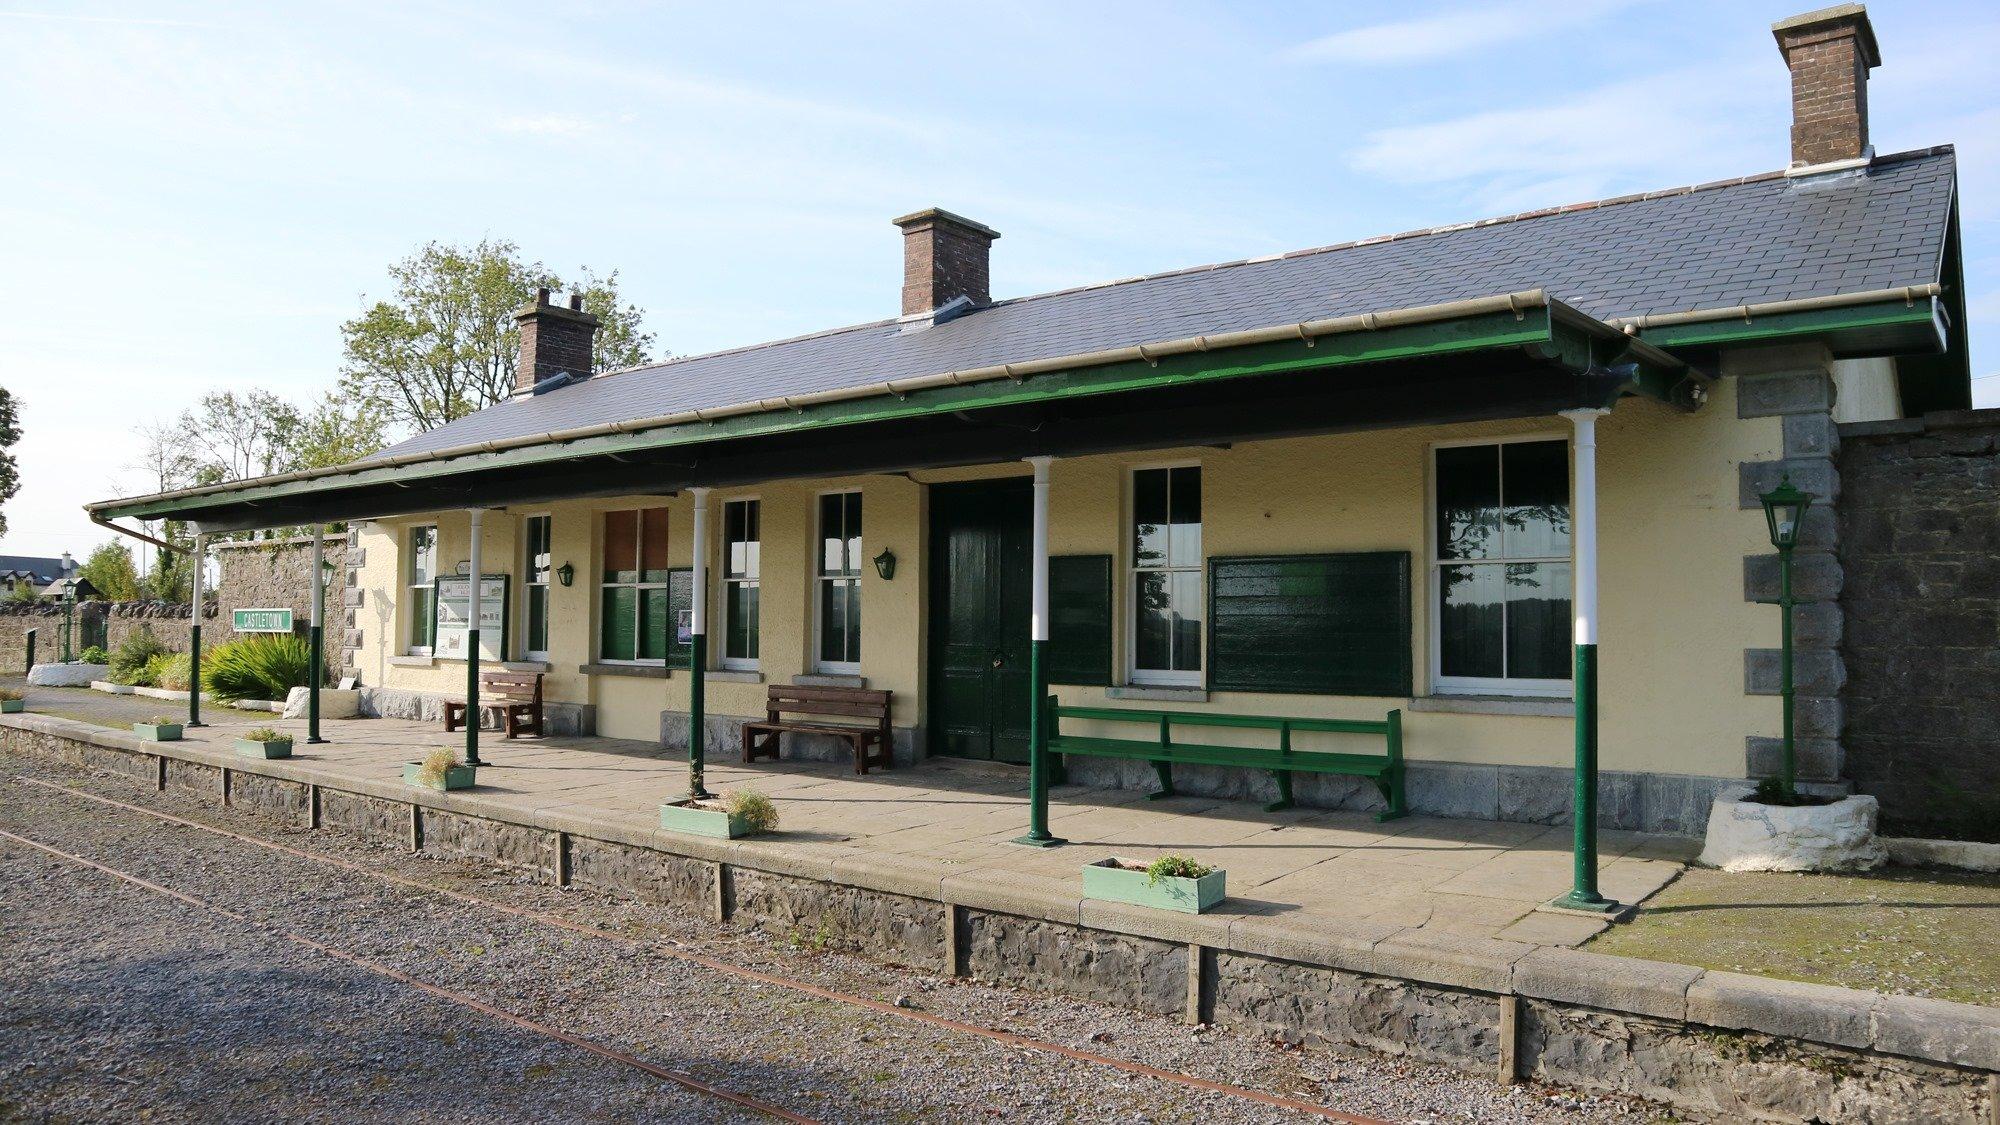 Ballyglunin Railway Station Galway - Visit Galway